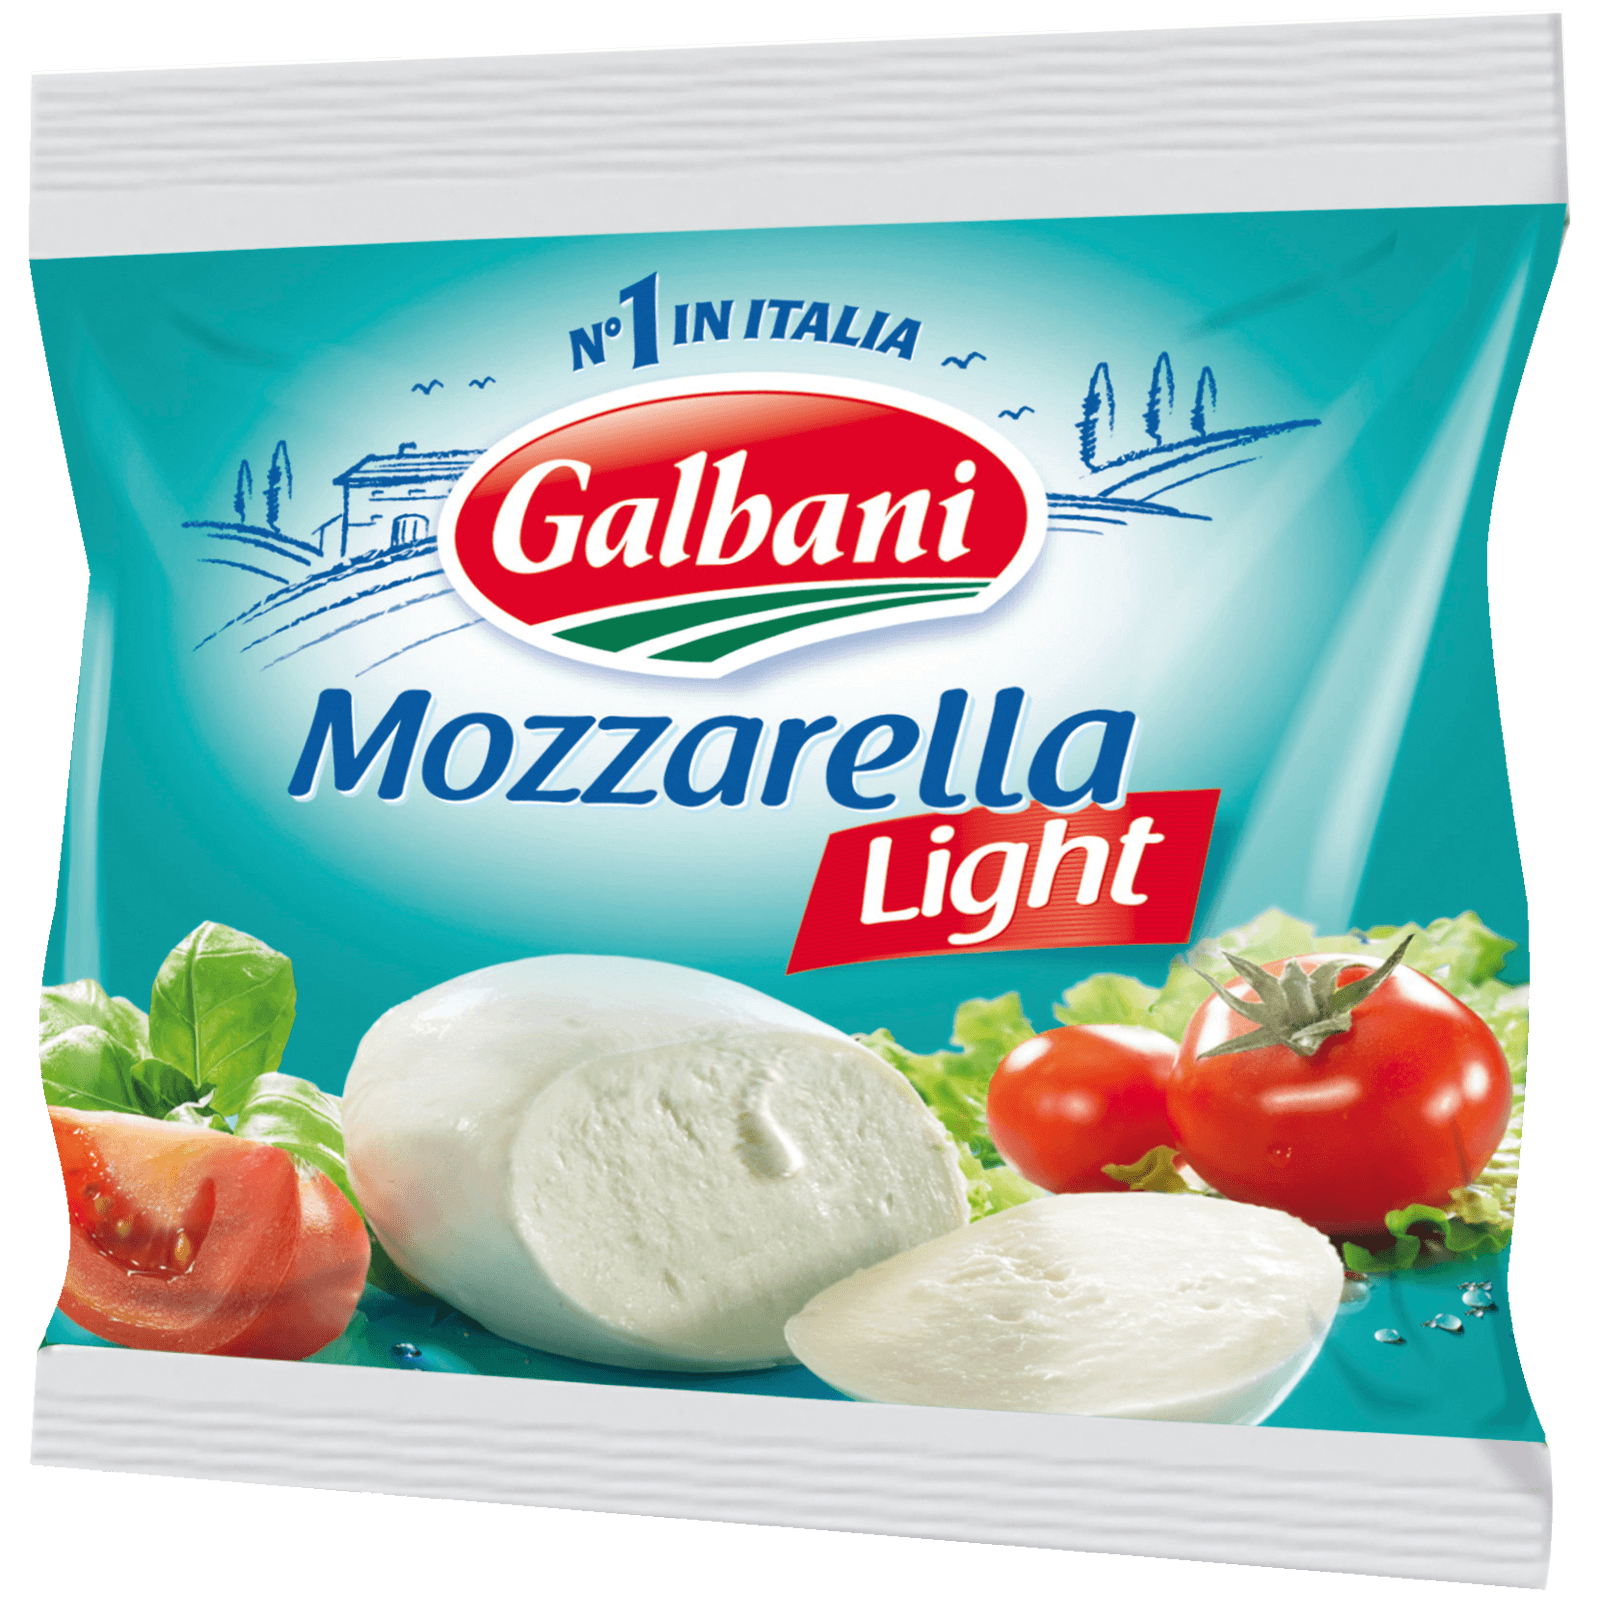 Galbani Mozzarella Light 125g